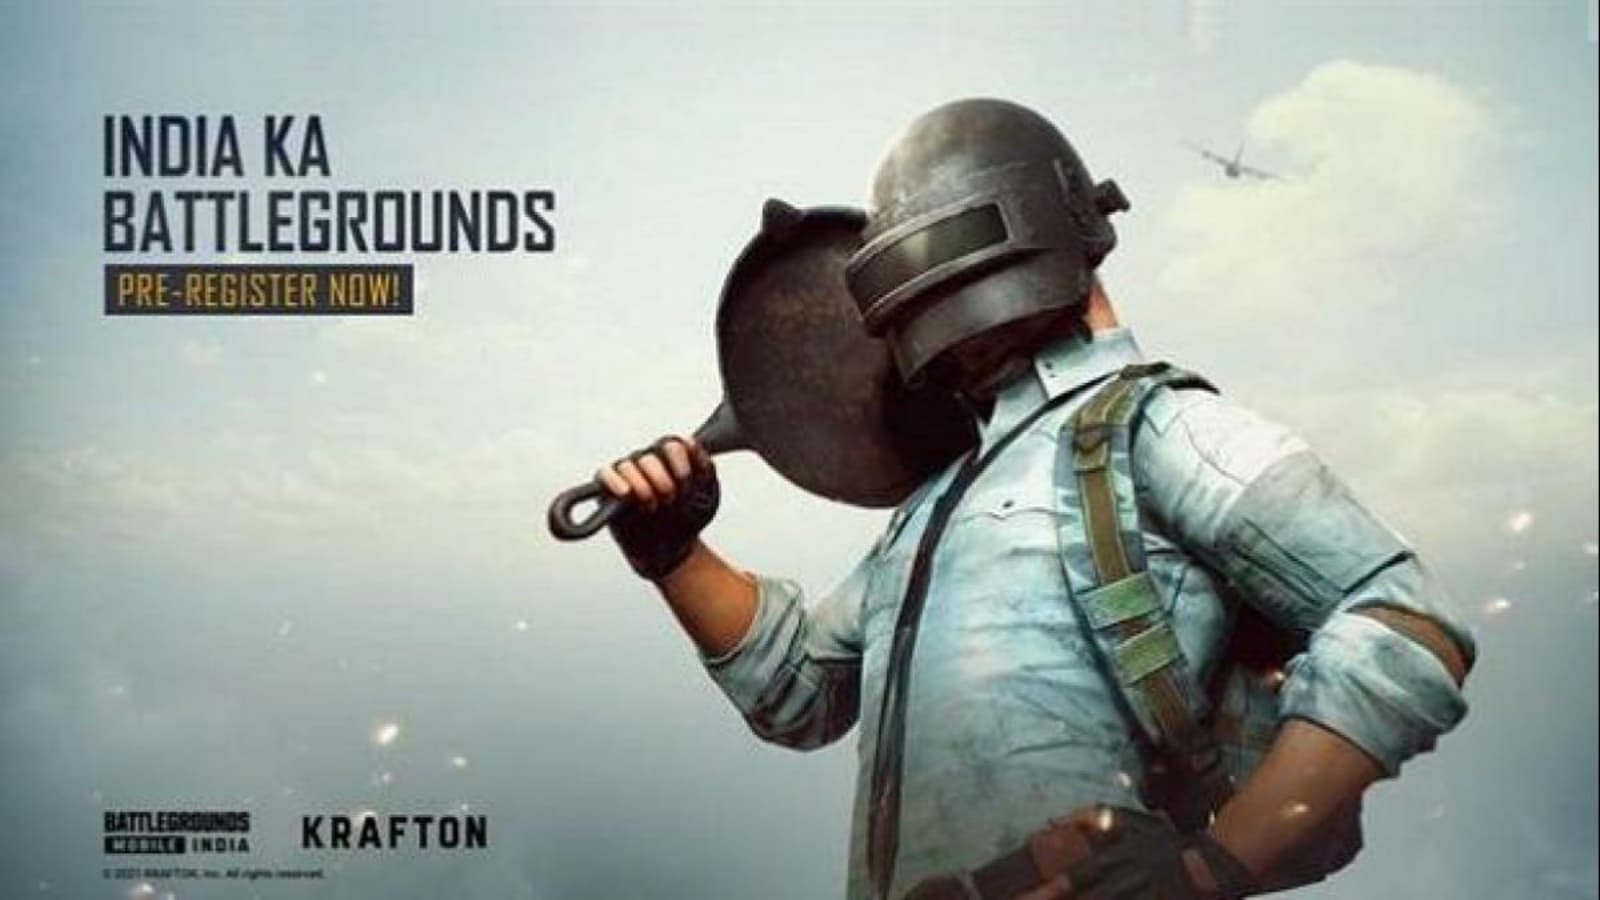 Battlegrounds Mobile India Gets 20 Million Pre-Registrations